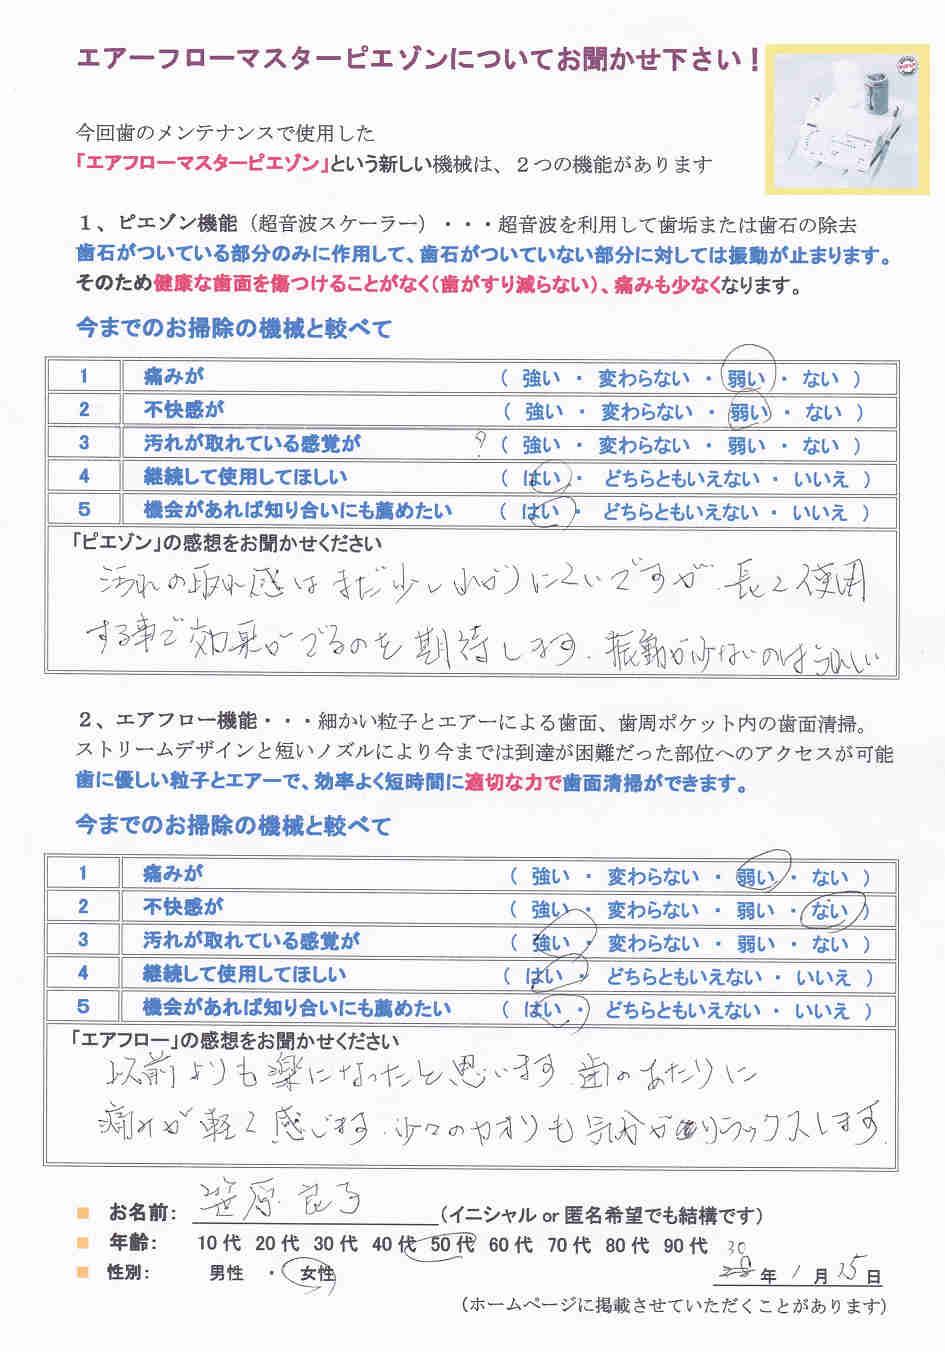 http://www.hayashi-dental.info/sasahara.jpg